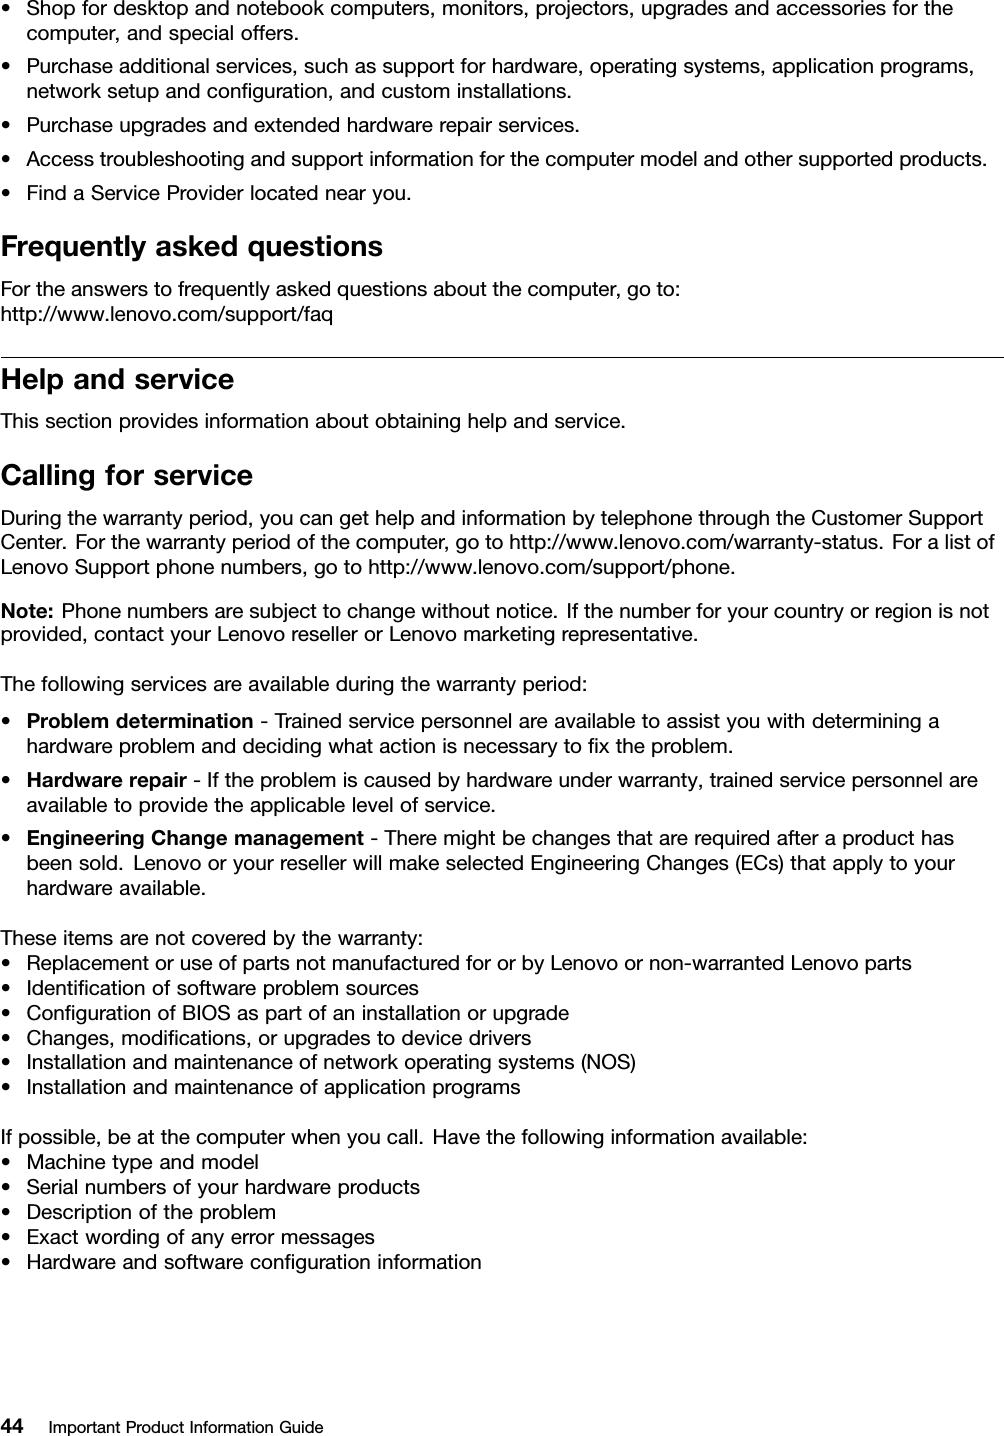 Lenovo Ipig V410Z En User Manual (English) Important Product